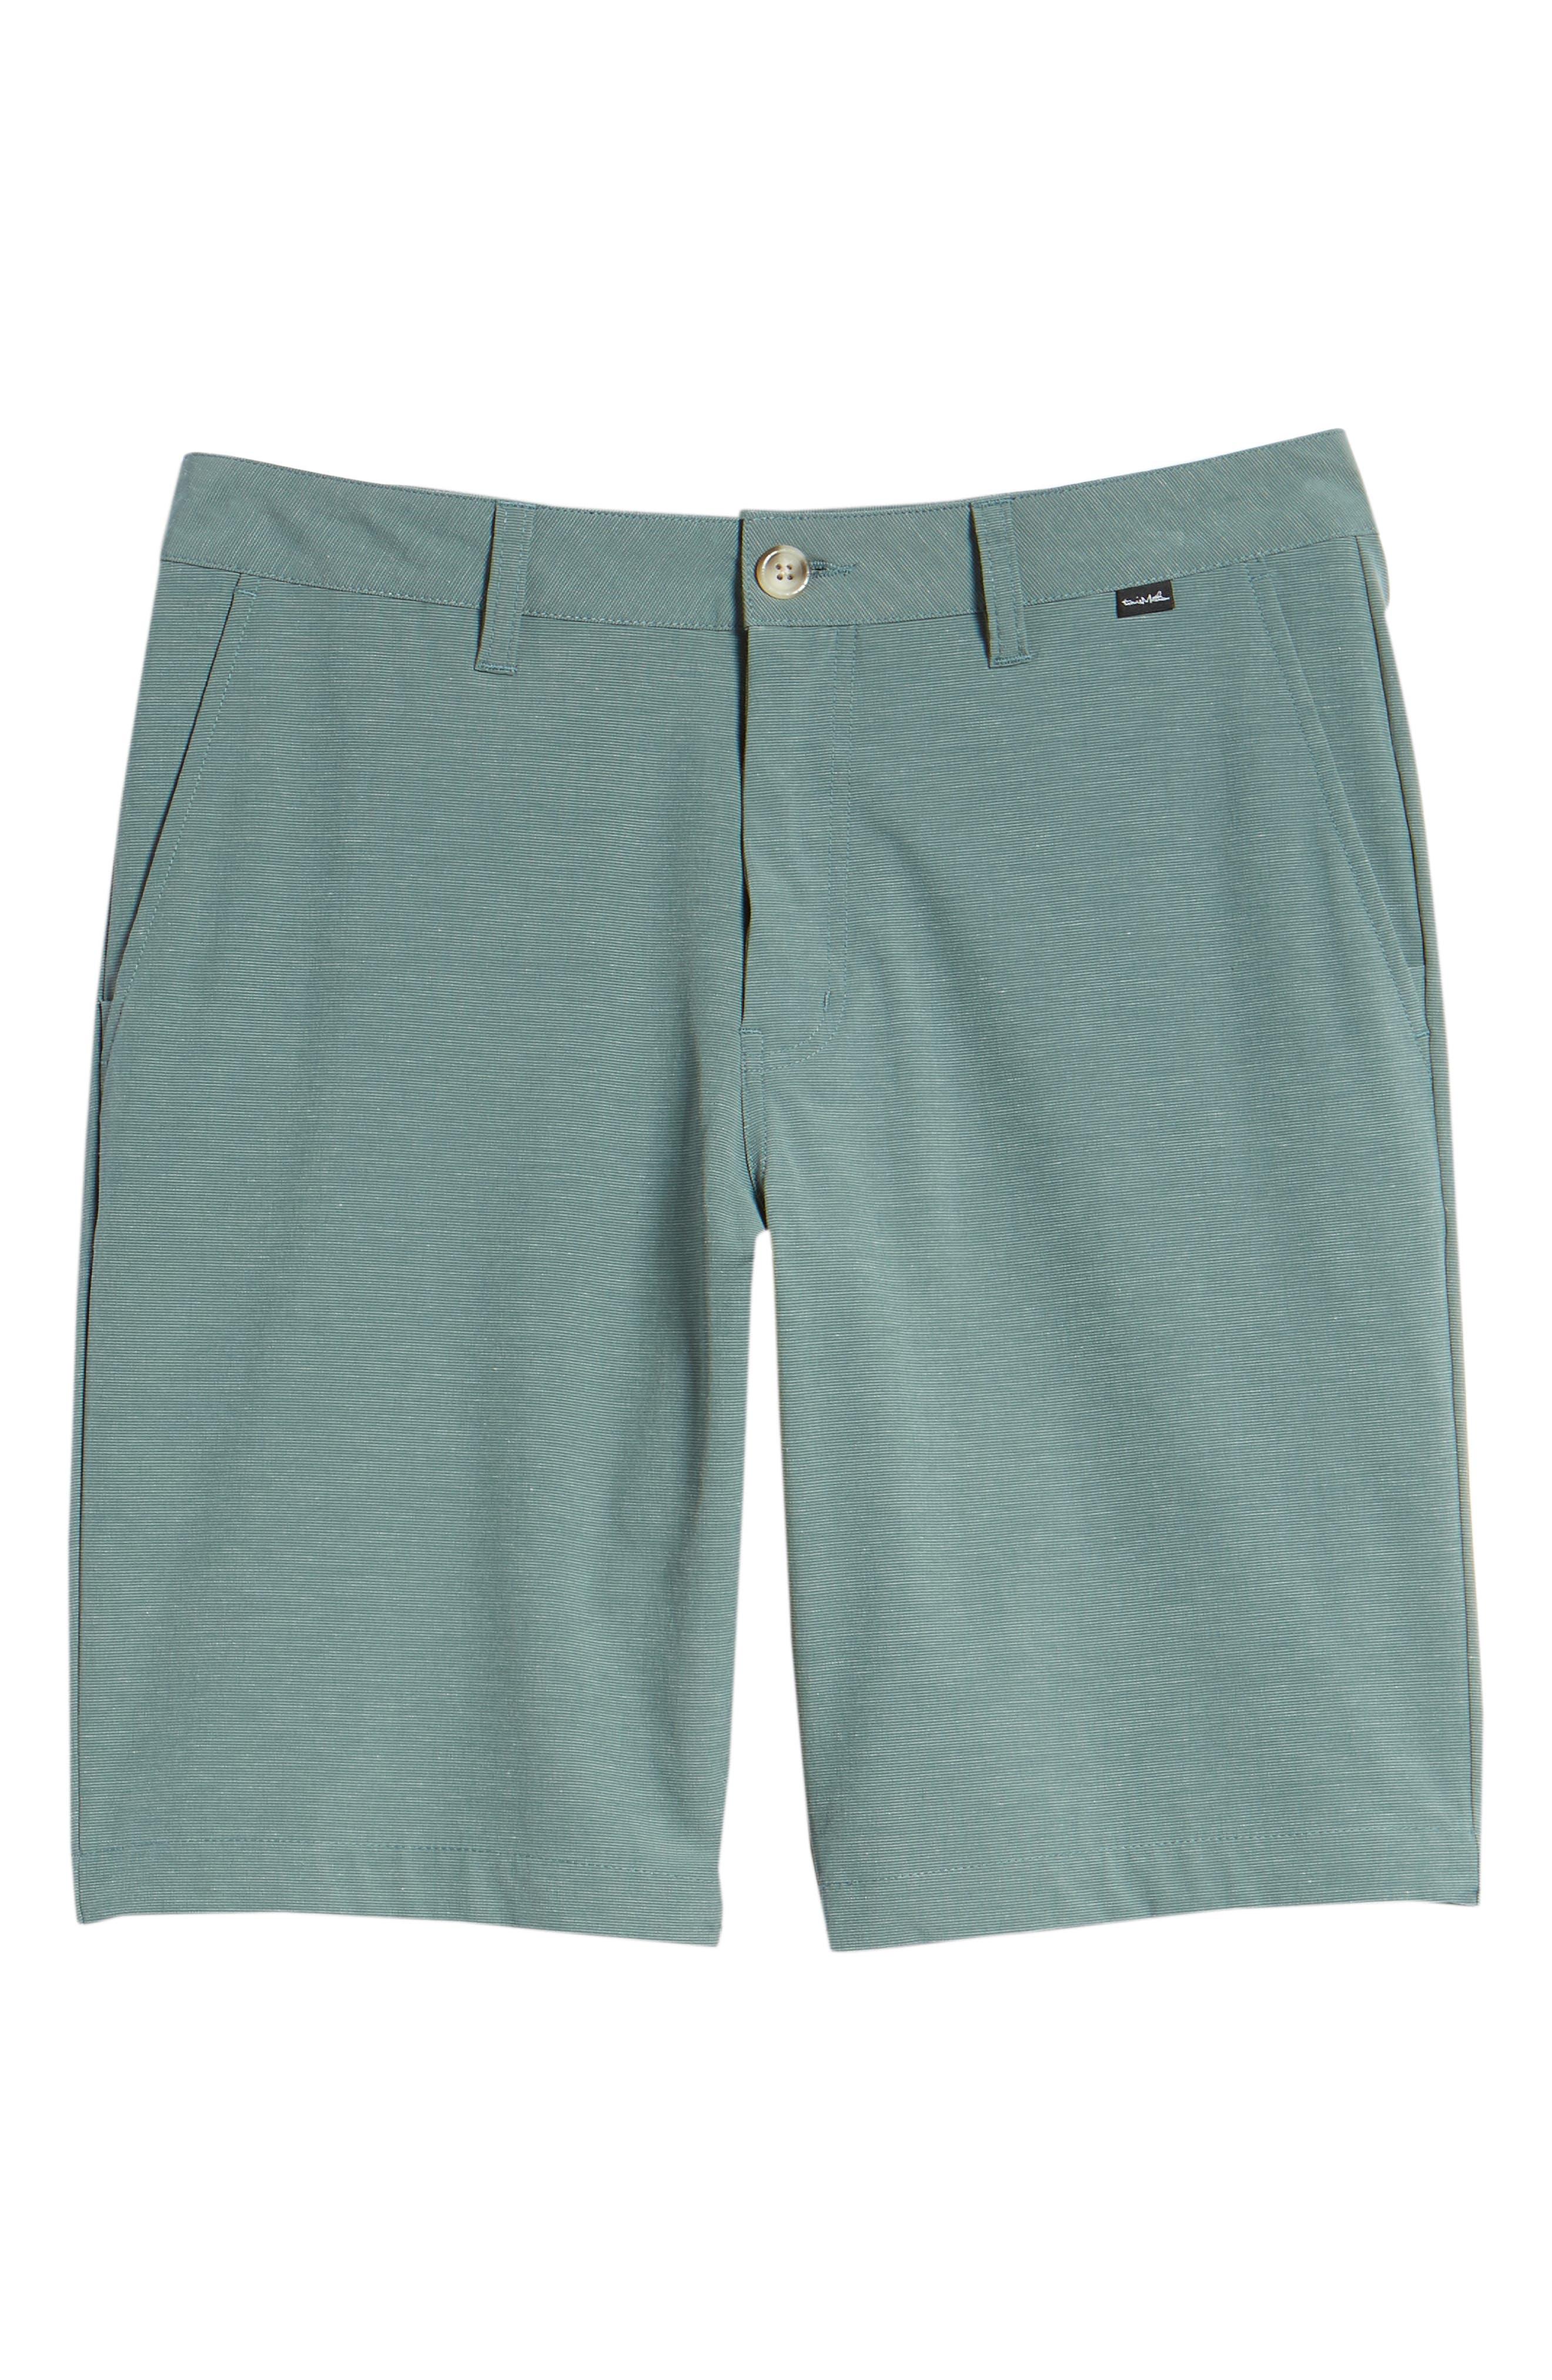 Revival Shorts,                             Alternate thumbnail 6, color,                             BALSAM GREEN